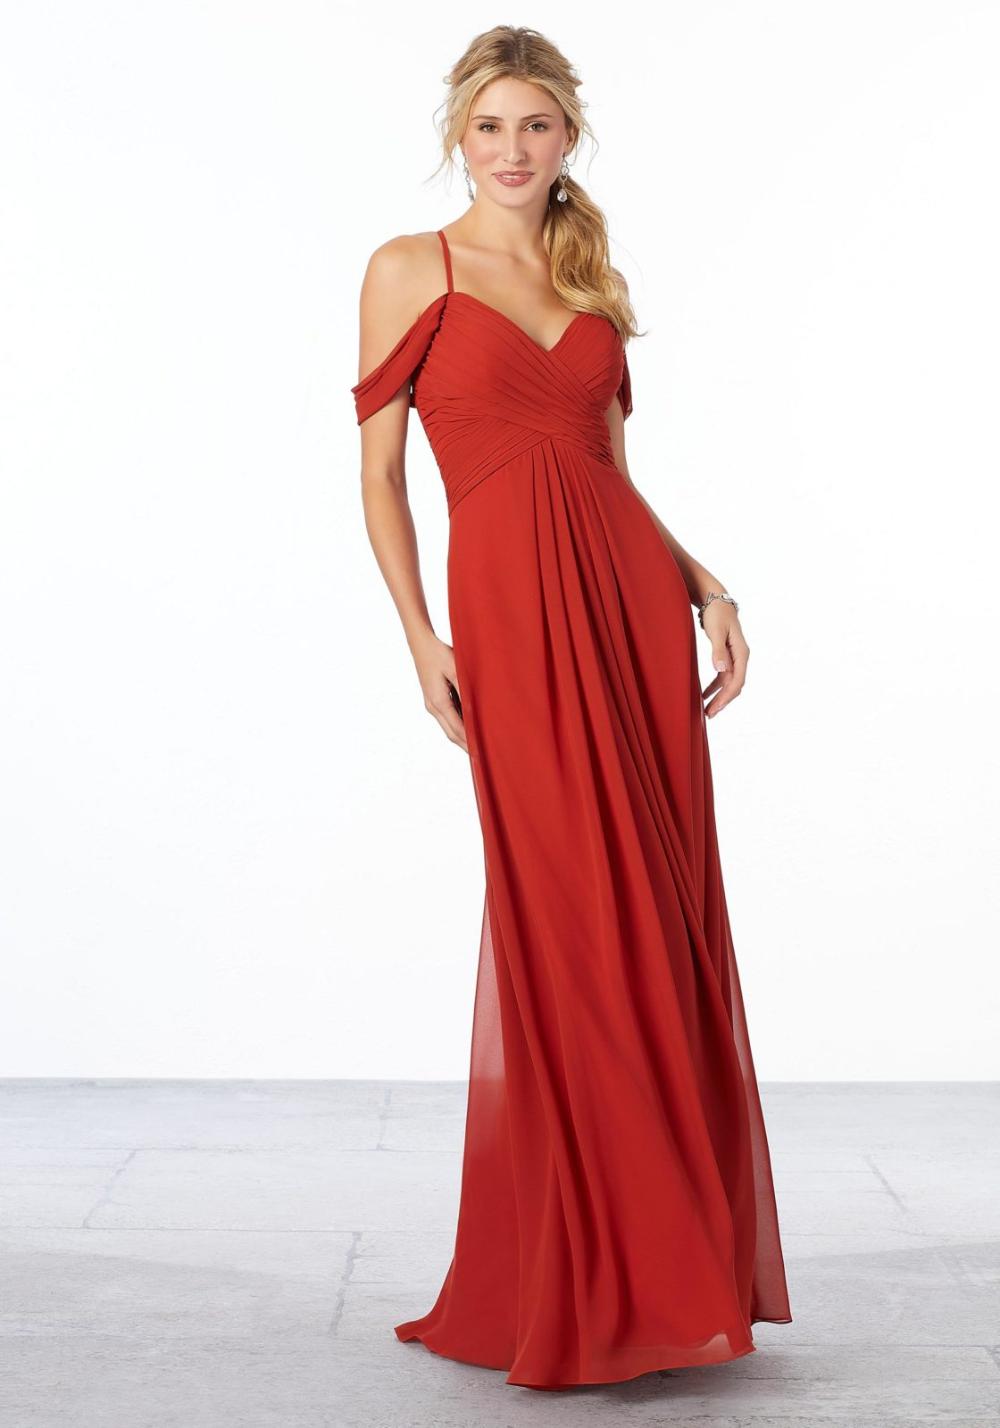 ColdShoulder Chiffon Bridesmaid Dress Morilee in 2020